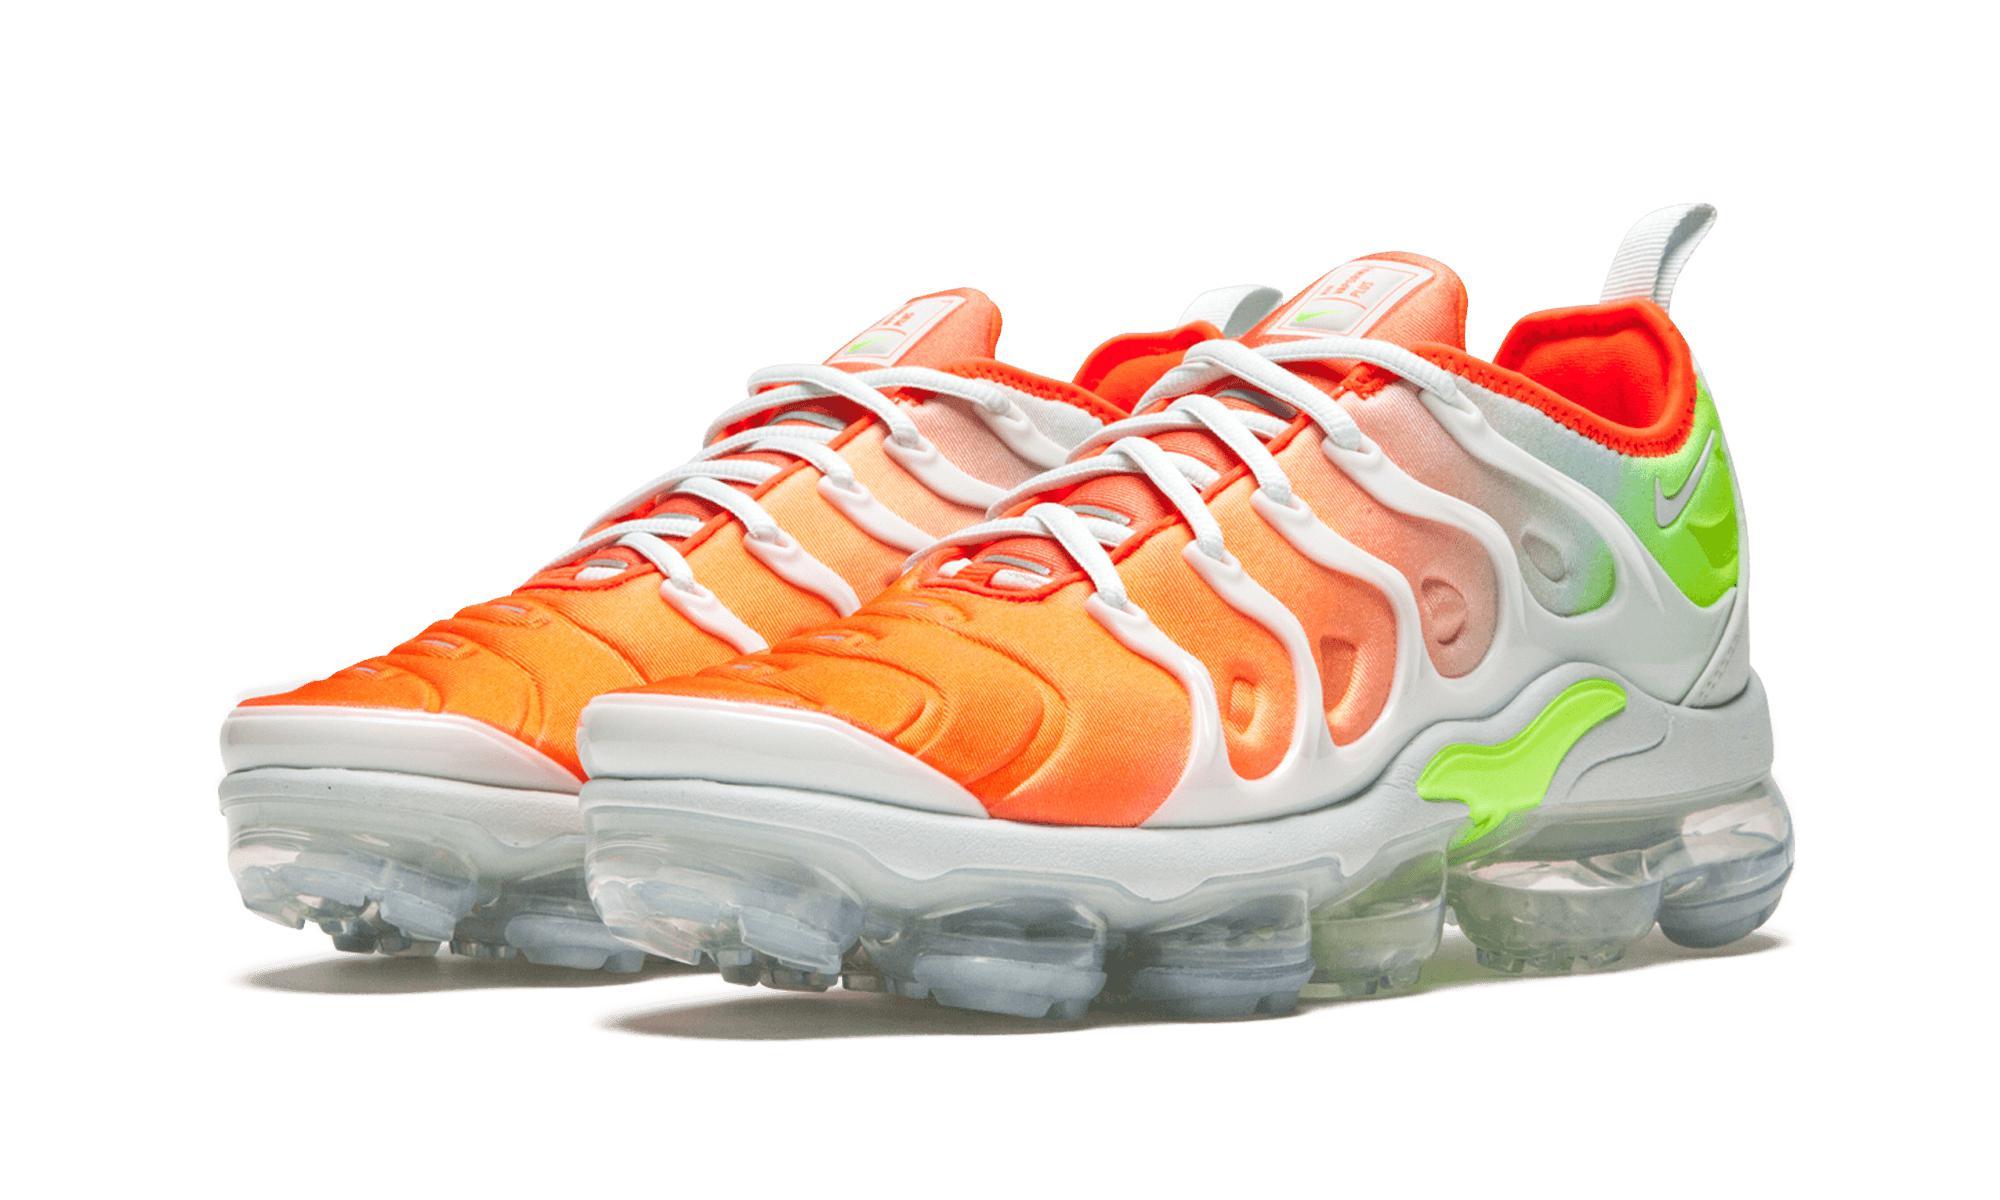 9e68e29aa984 Lyst - Nike Womens Air Vapormax Plus in Gray - Save 31%